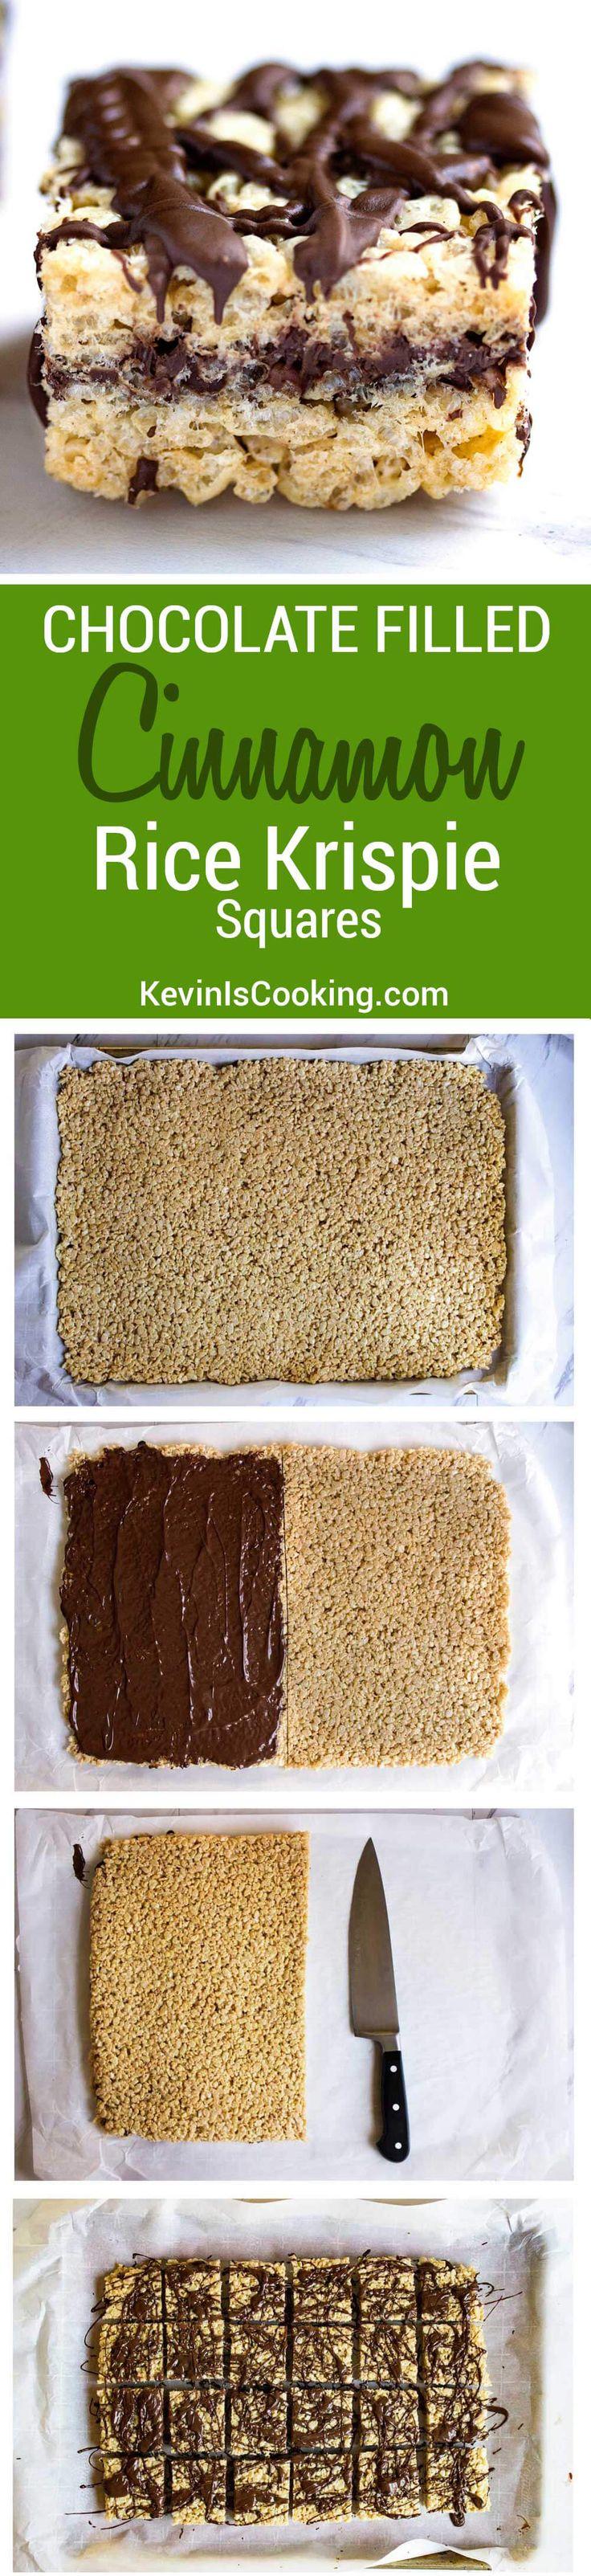 Cinnamon Rice Krispie Squares